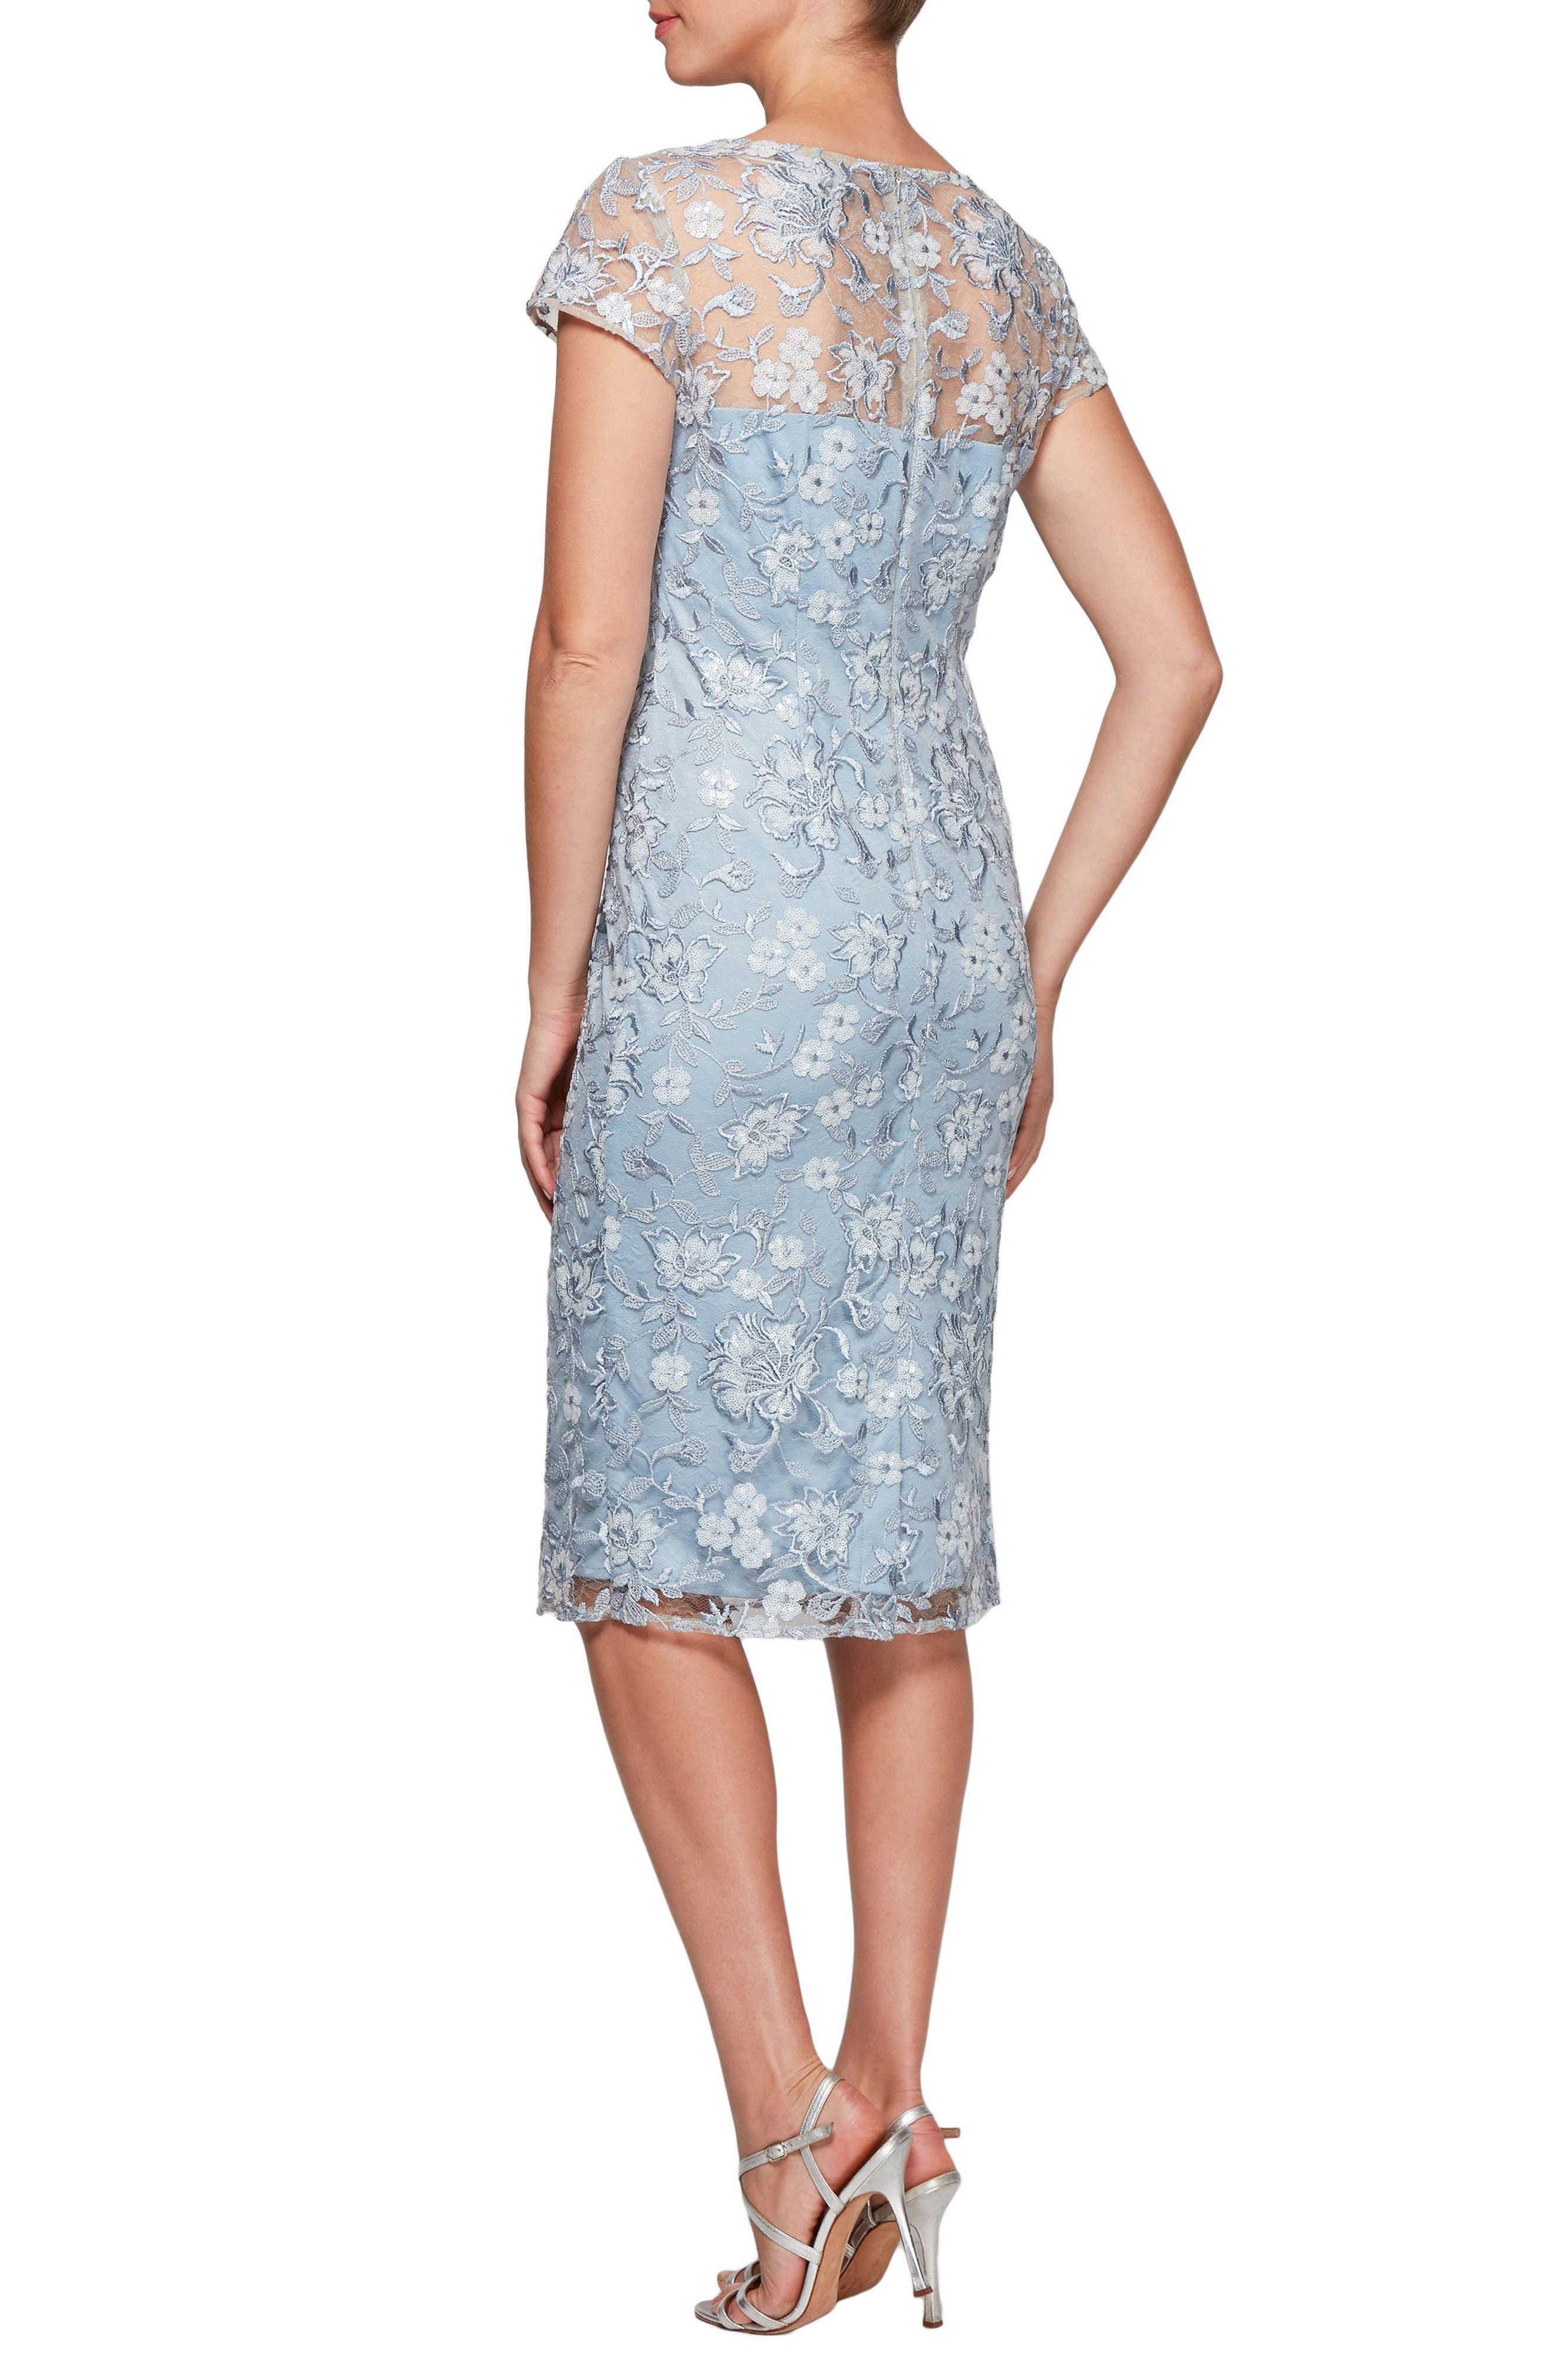 Floral Embroidered Shift Dress,                             Alternate thumbnail 2, color,                             LIGHT BLUE